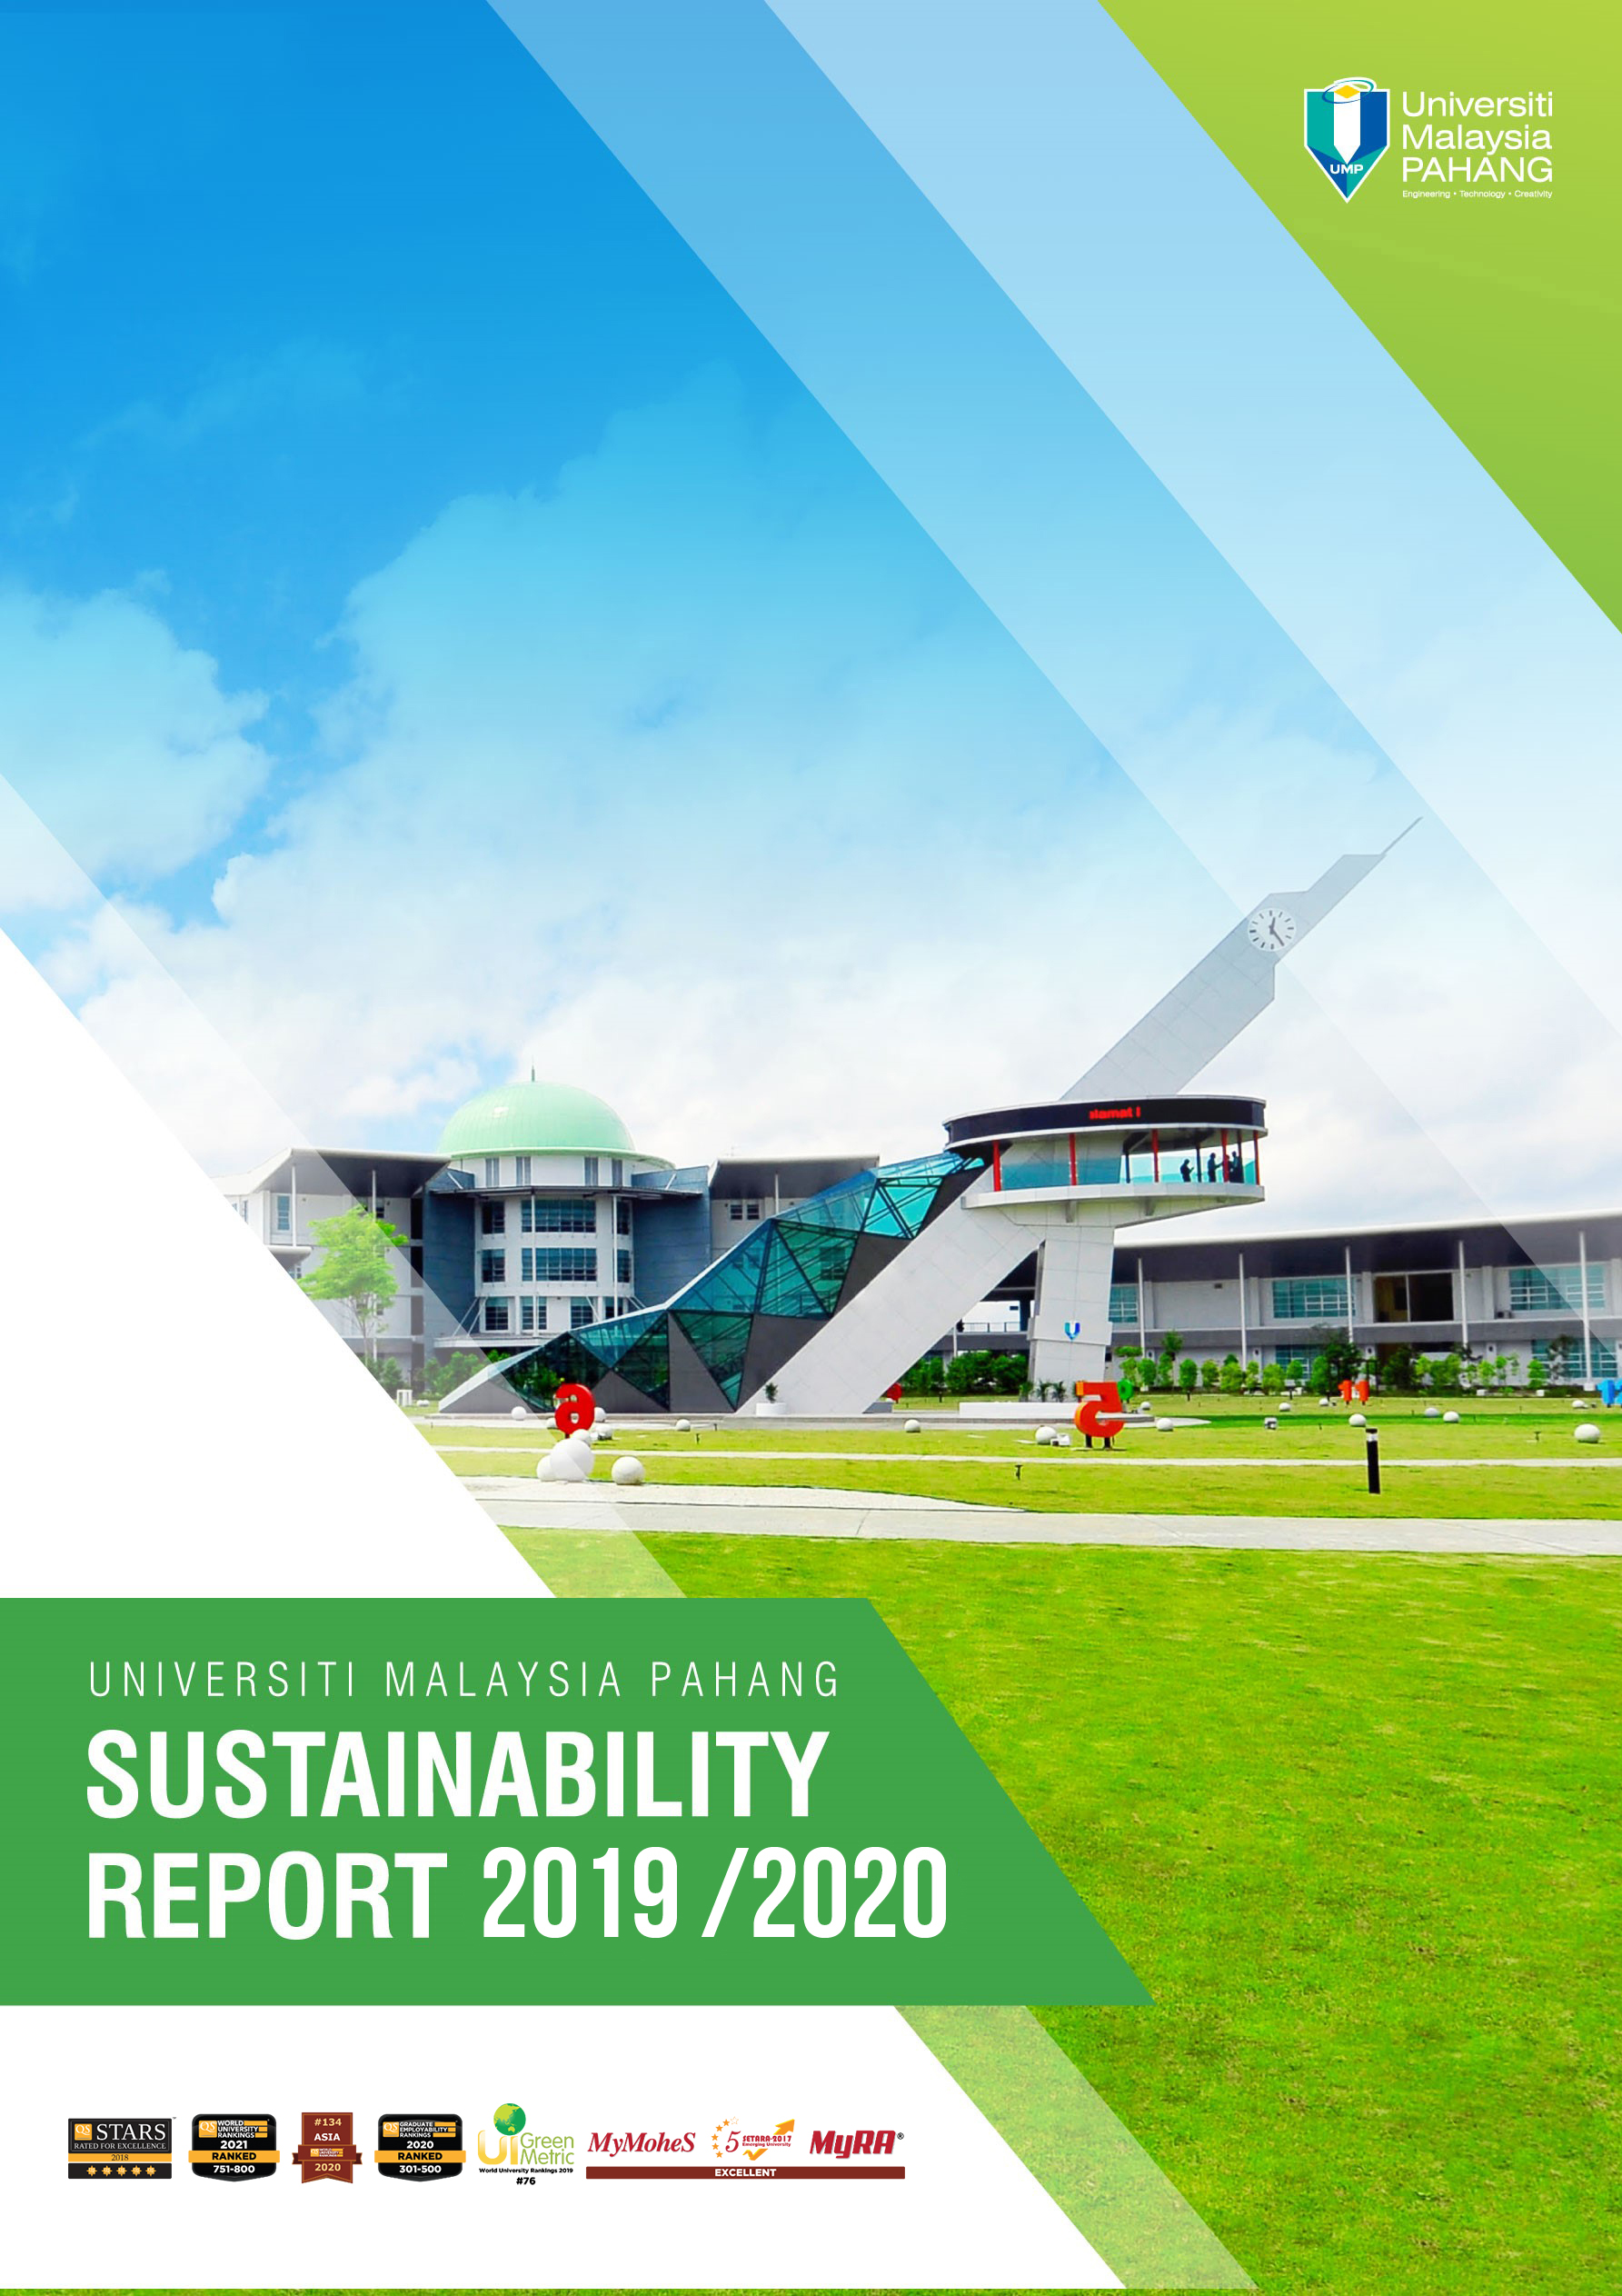 UMP SUSTAINABILITY REPORT 2019/2020